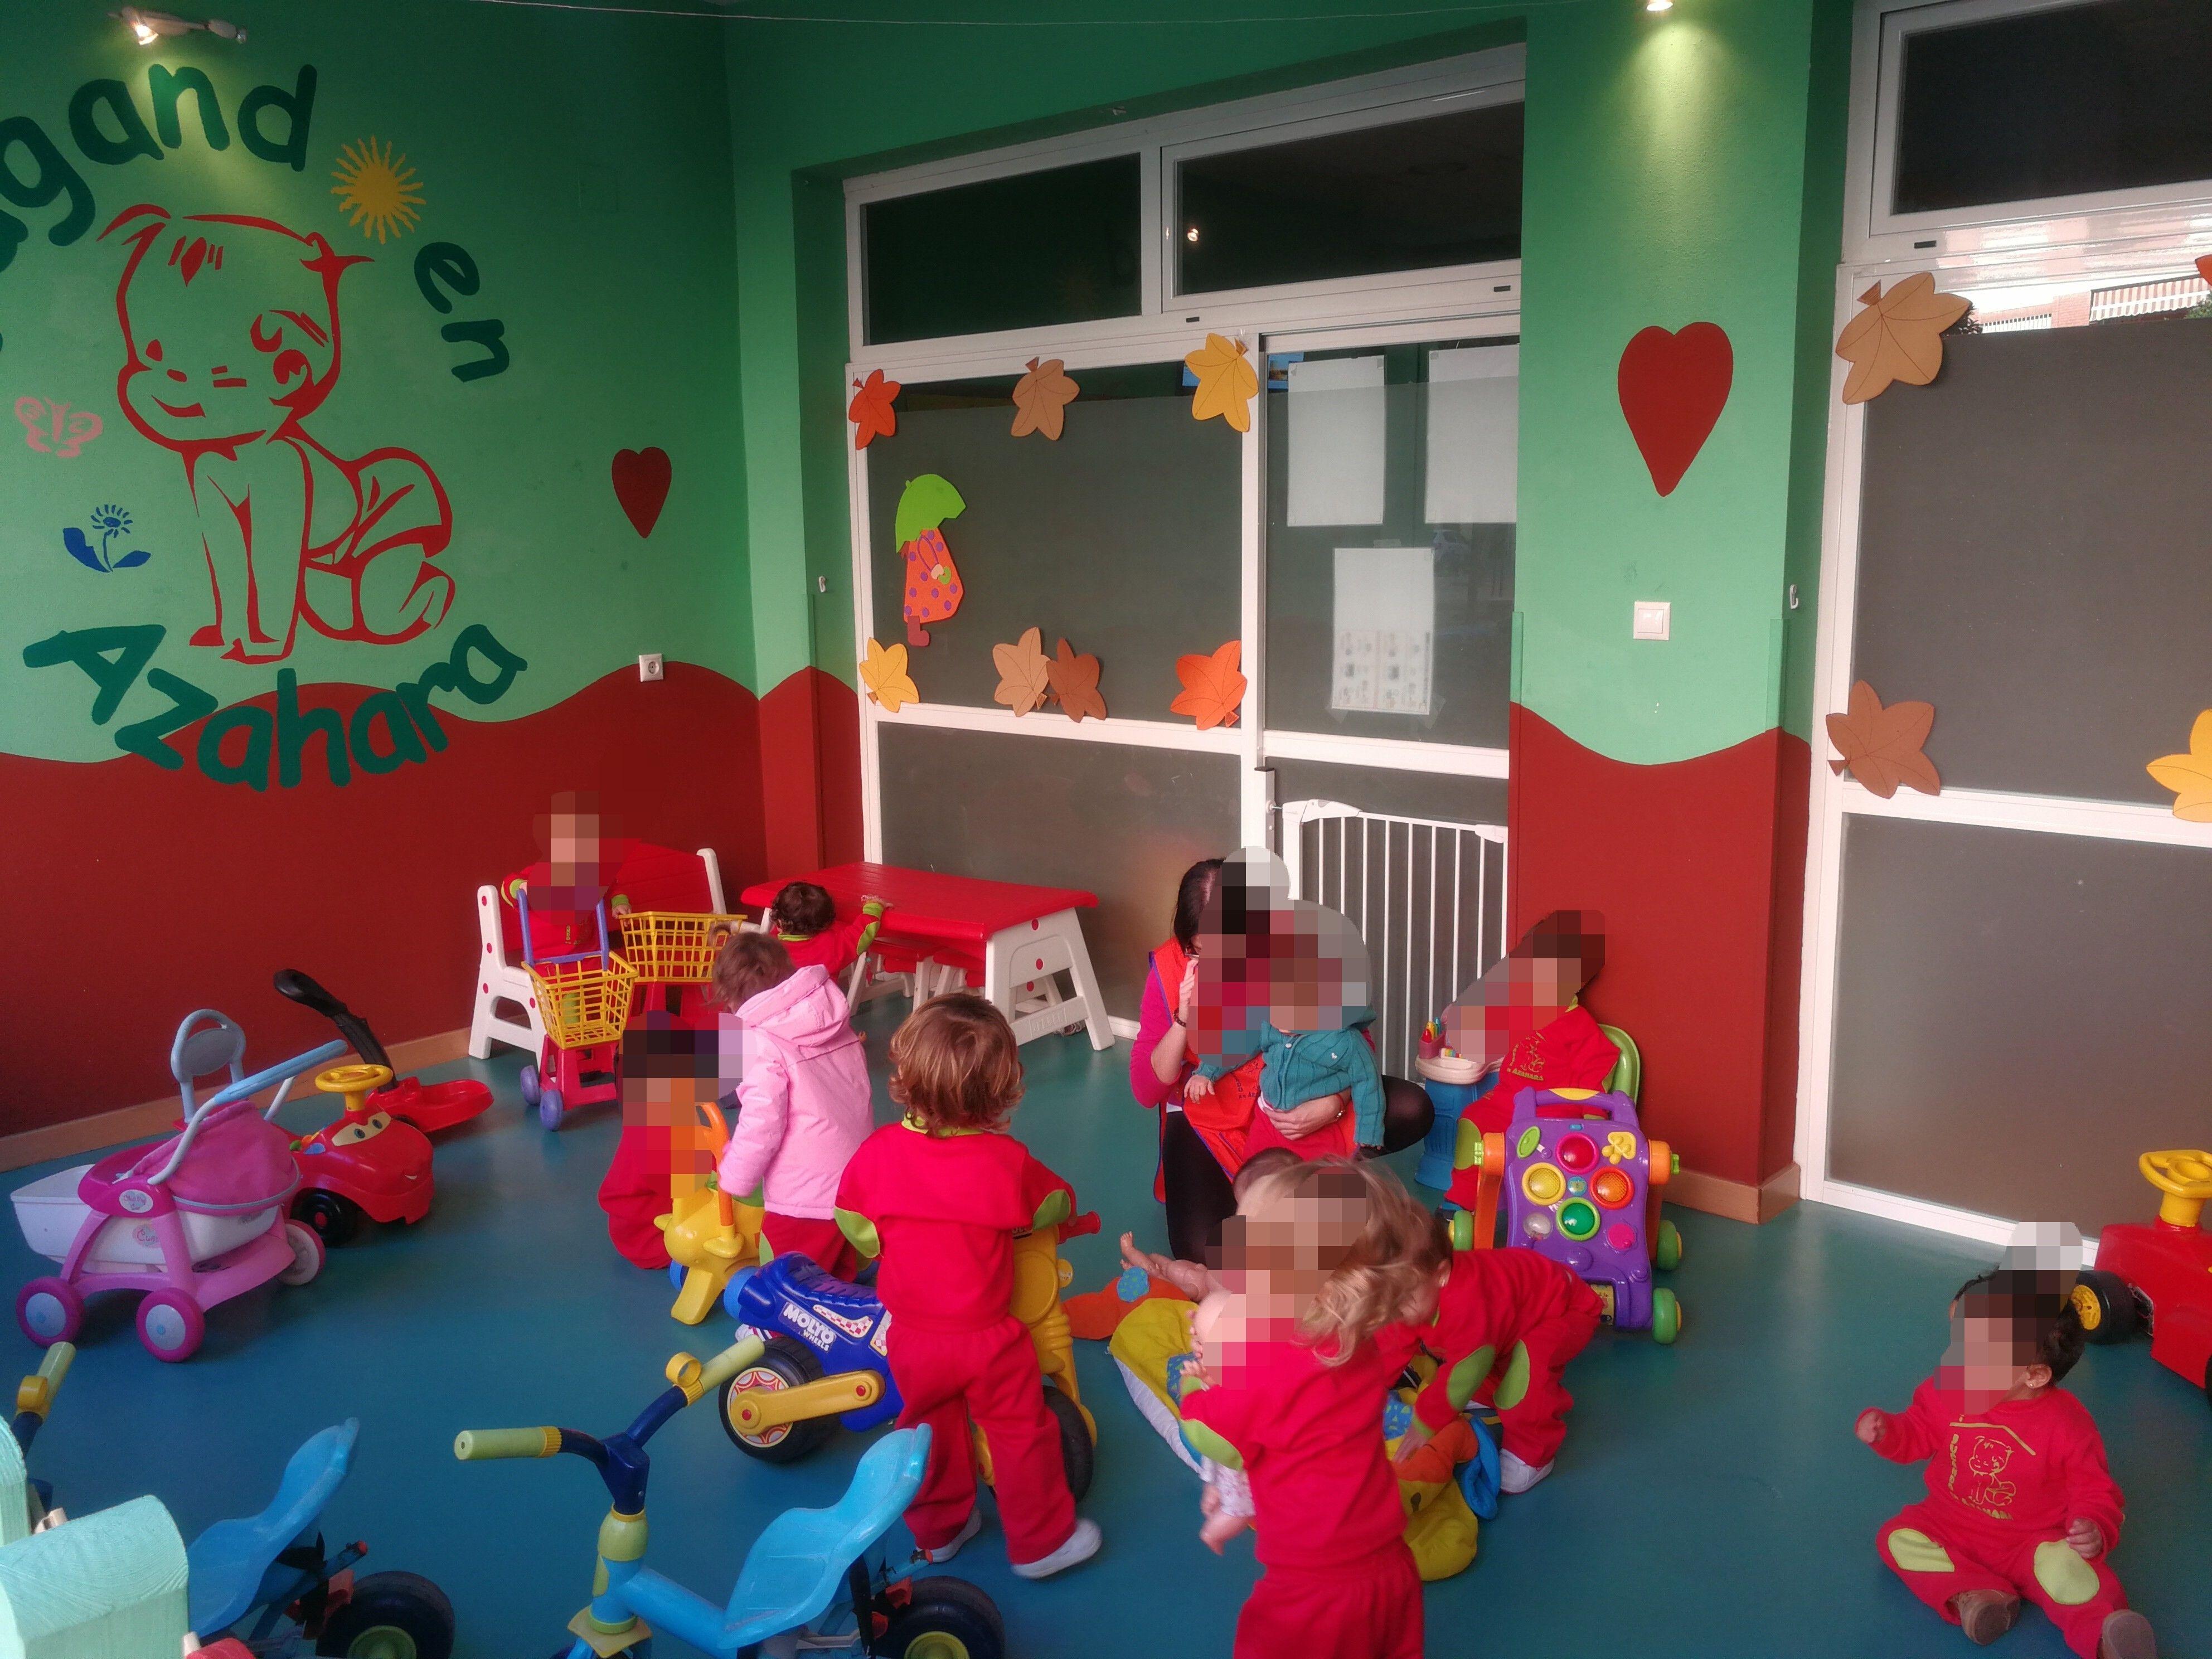 Foto 38 de Escuela infantil bilingüe en Córdoba en Córdoba   Jugando en Azahara